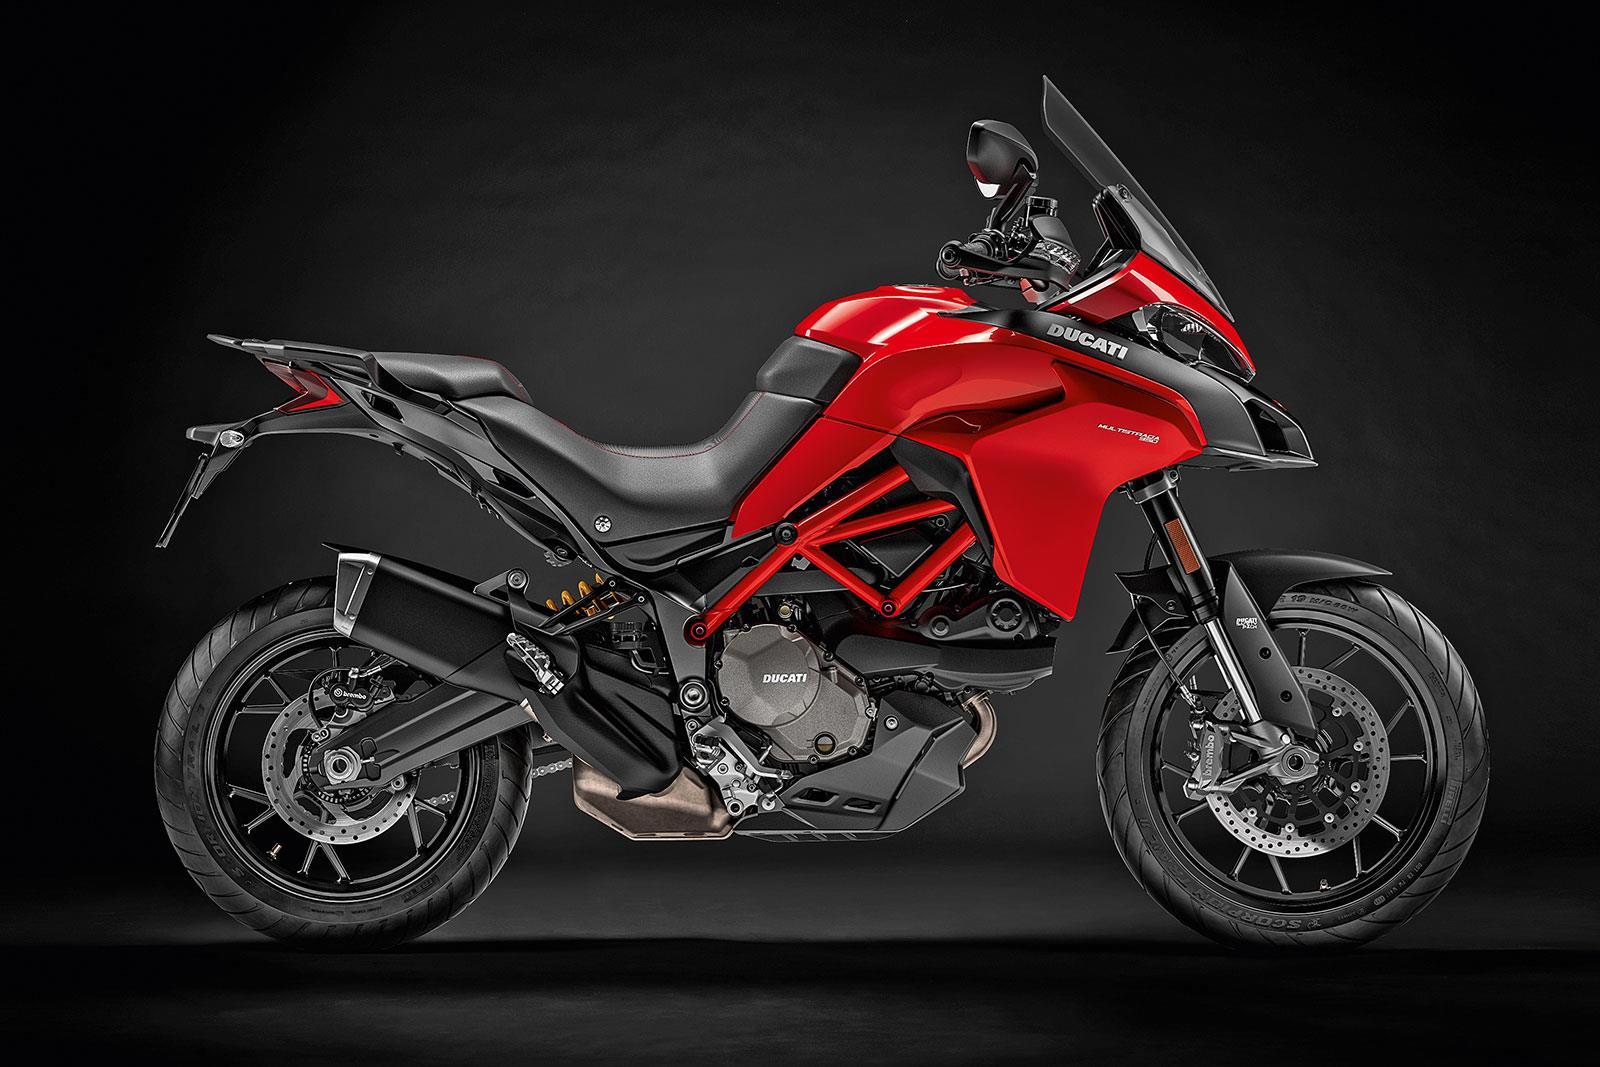 Ducati Multistrada 950 2019 On Review Mcn